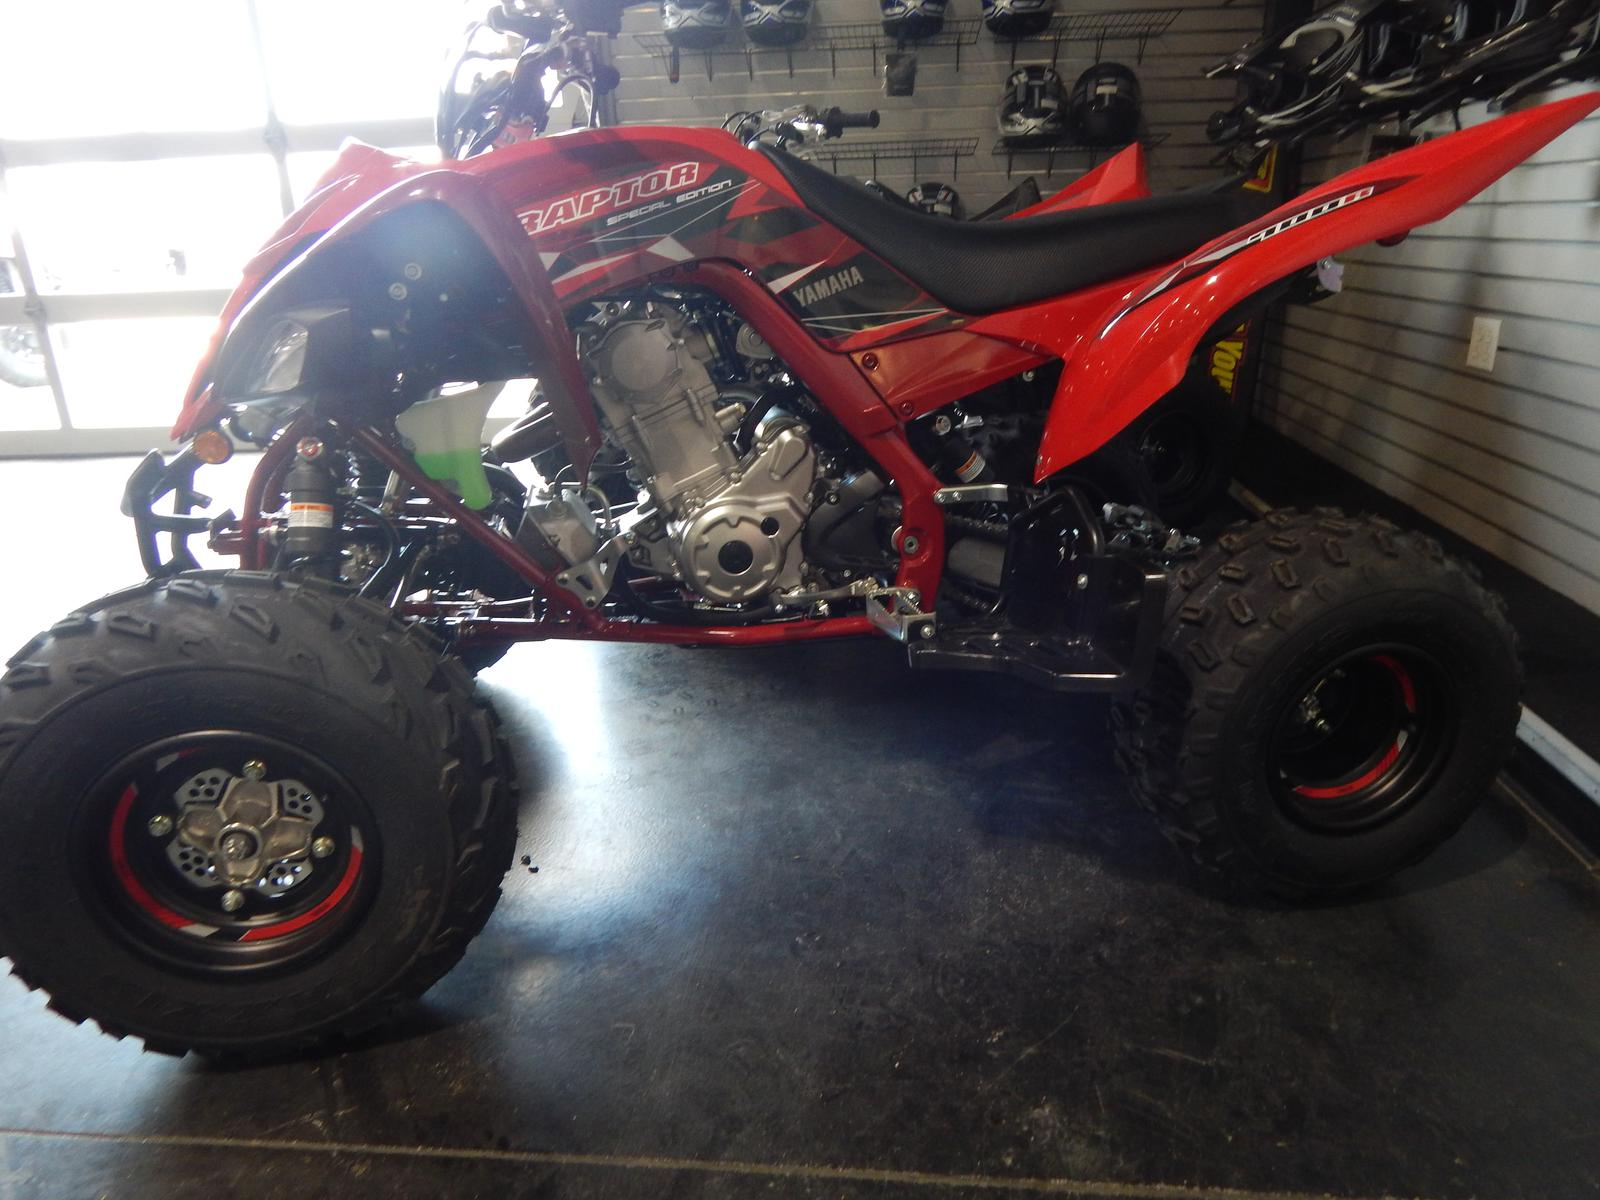 2019 Yamaha Raptor 700r Se For Sale In Morehead Ky Cave Run Kodiak 450 Winch Wiring Diagram Motorsports 606 784 2300